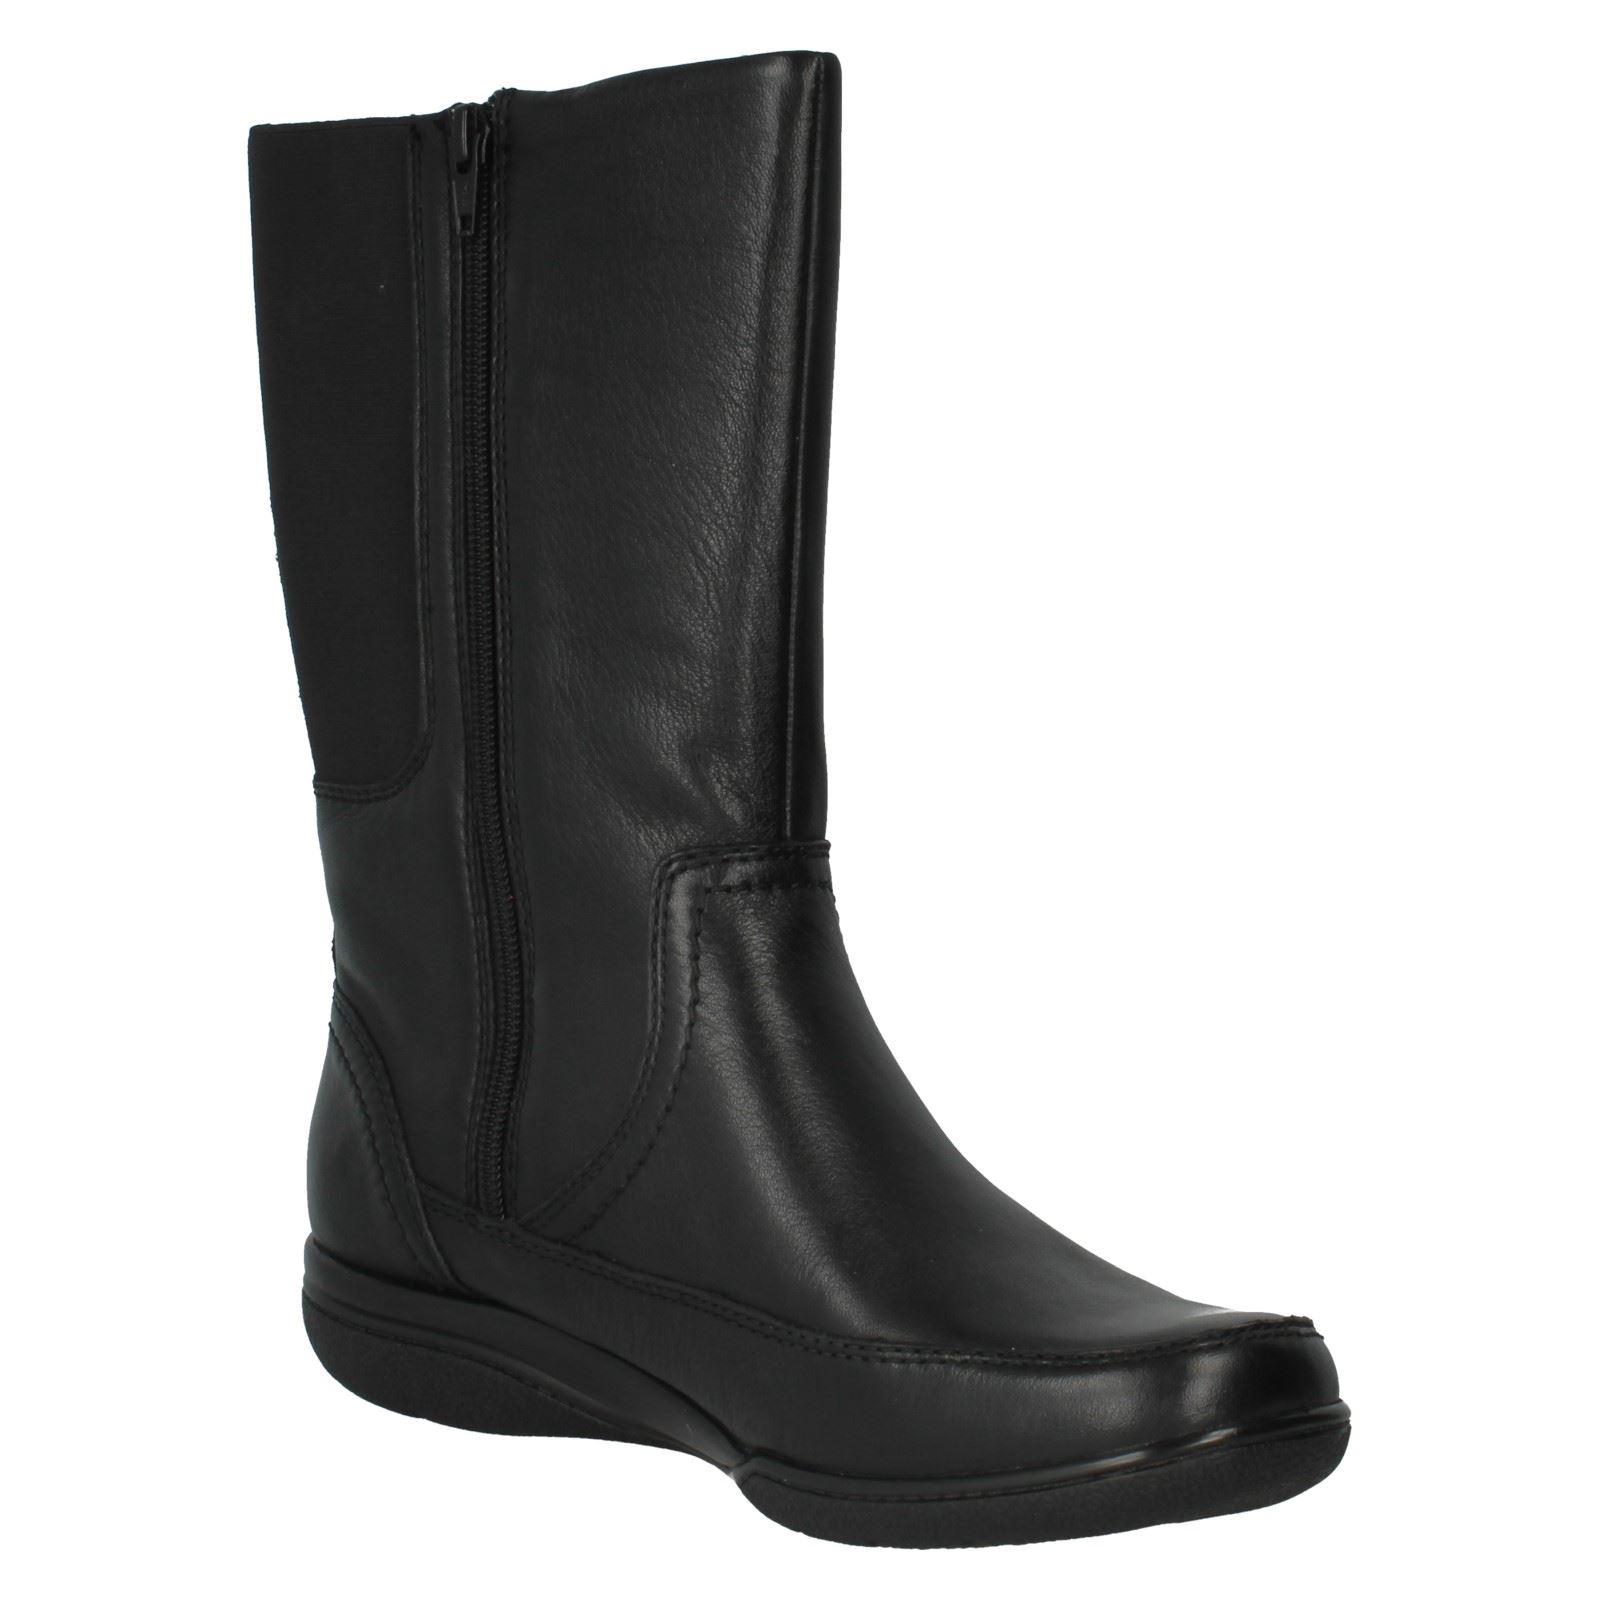 Ladies Clarks Casual Fasten Boots Style - Kearns Rain